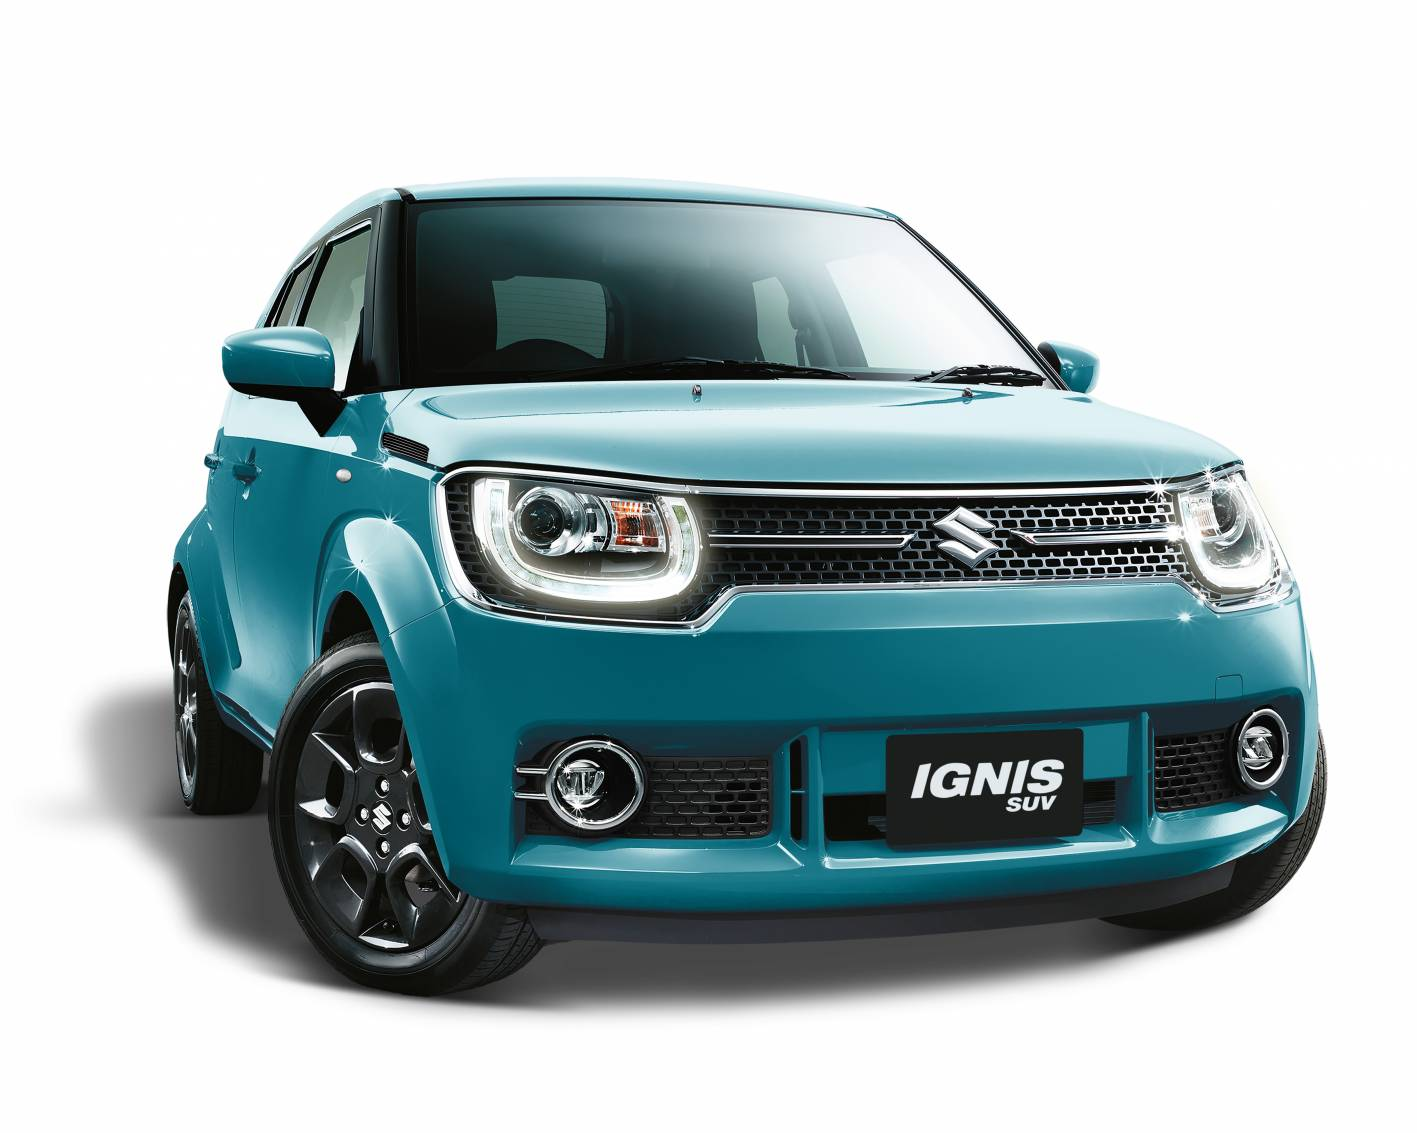 Funky New 2017 Suzuki Ignis Arrives In Australia From